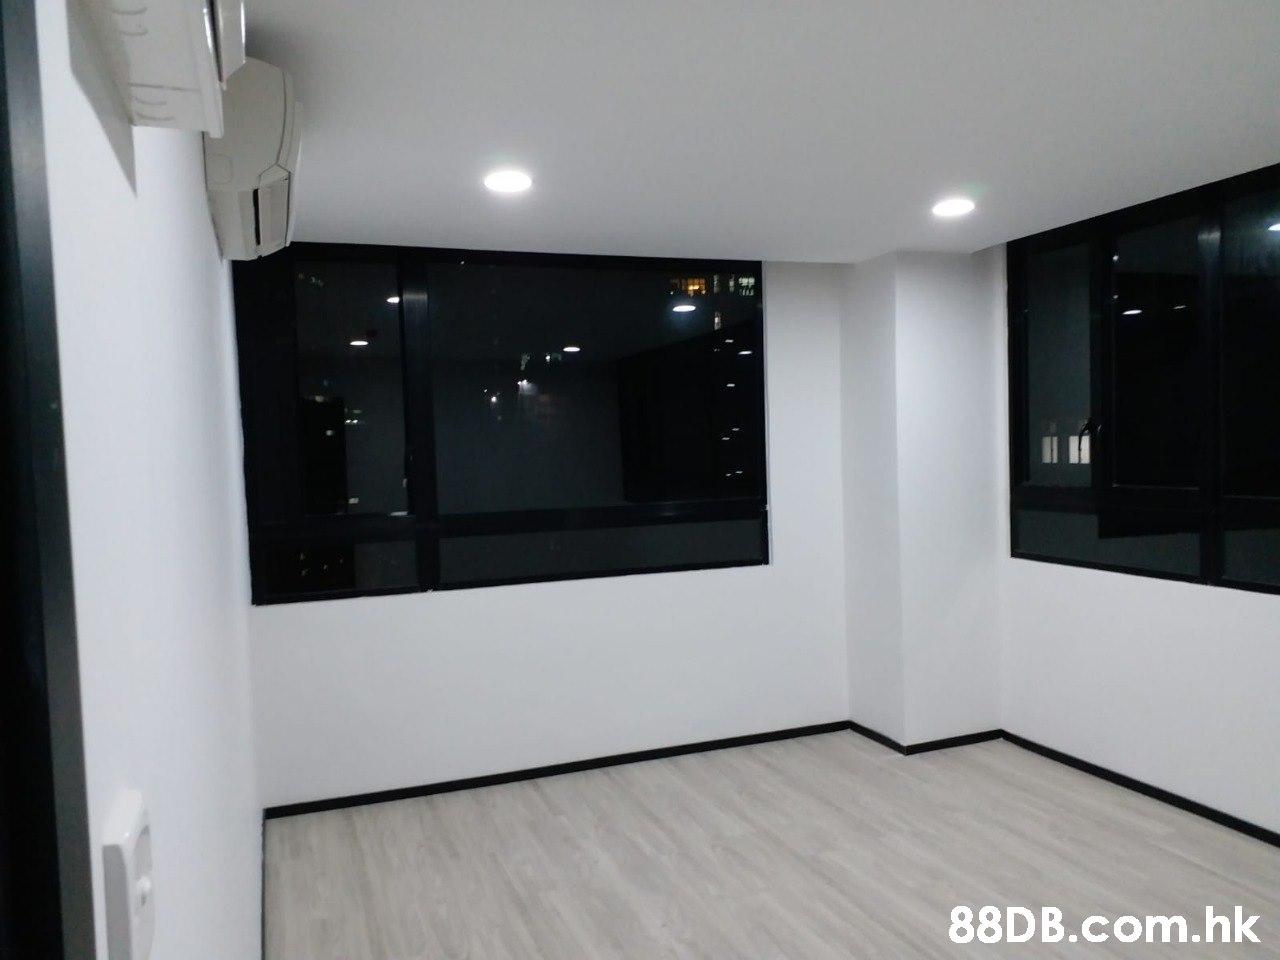 .hk  Property,Room,Interior design,Building,Floor